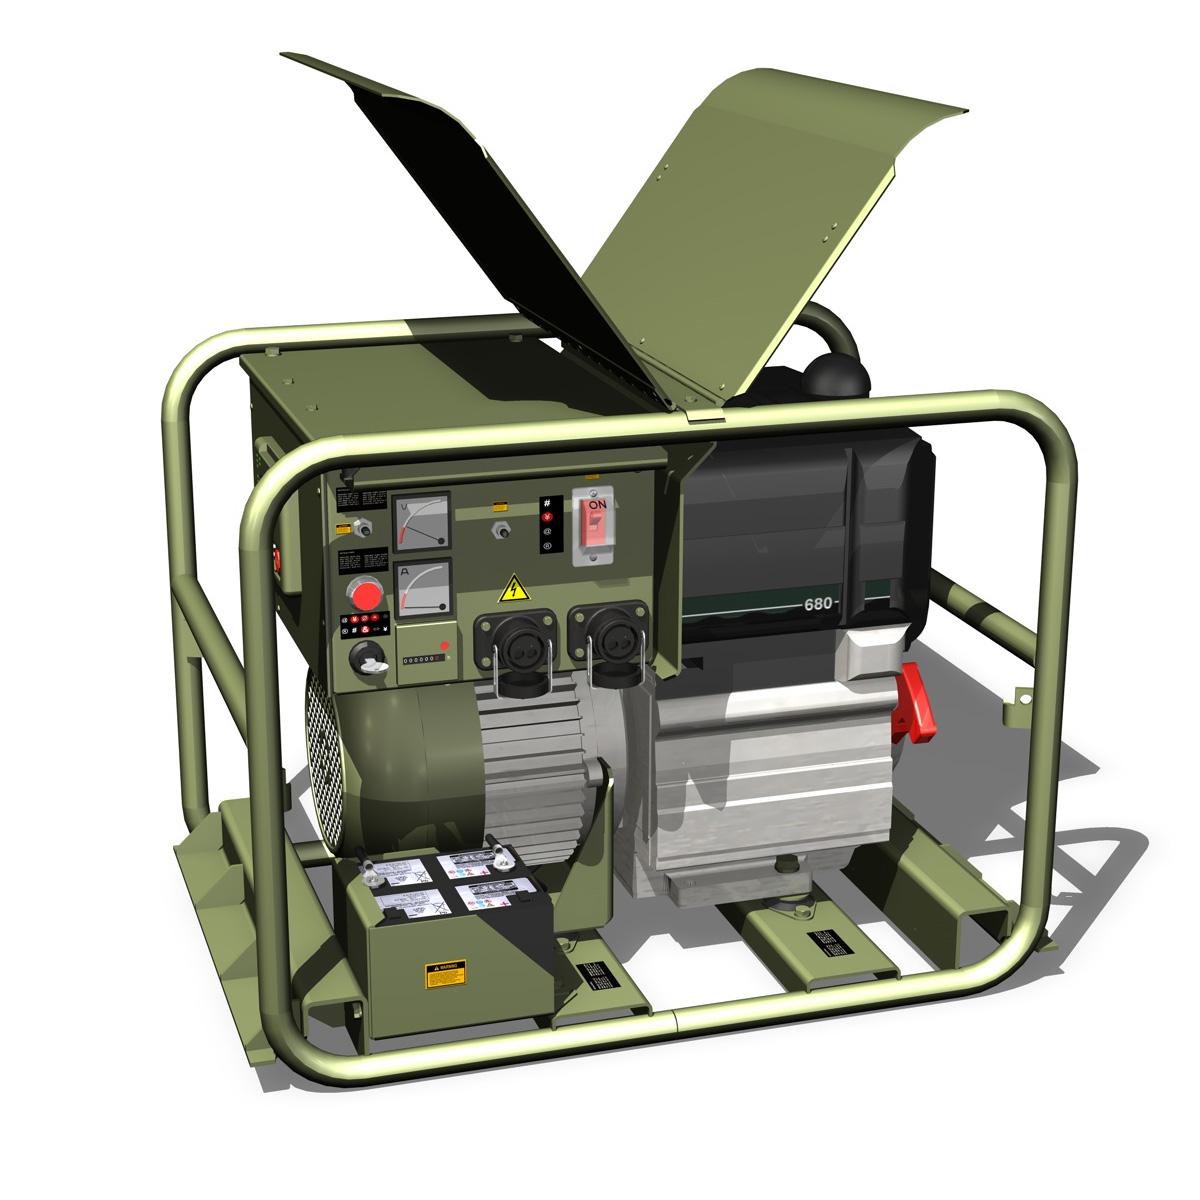 military diesel generator 3d model 3ds fbx c4d lwo obj 188561